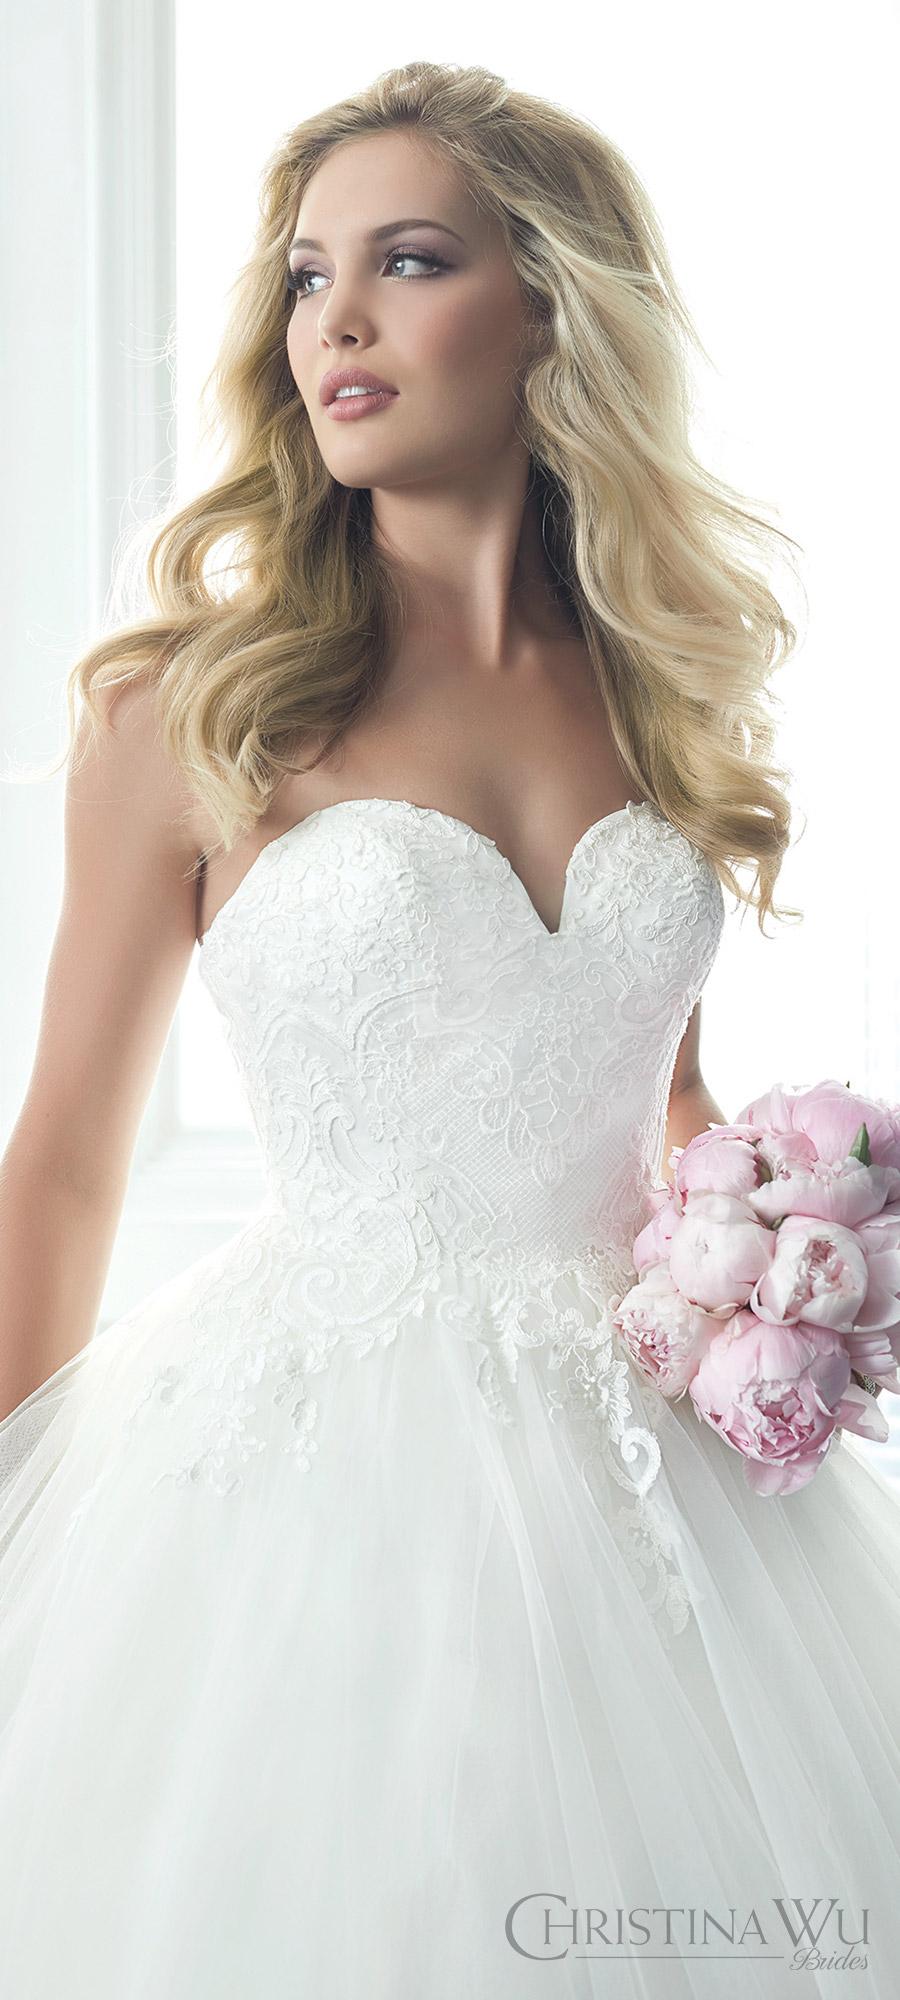 christina wu brides spring 2017 bridal strapless sweetheart lace embellished ball gown wedding dress (15621) mv romantic princess